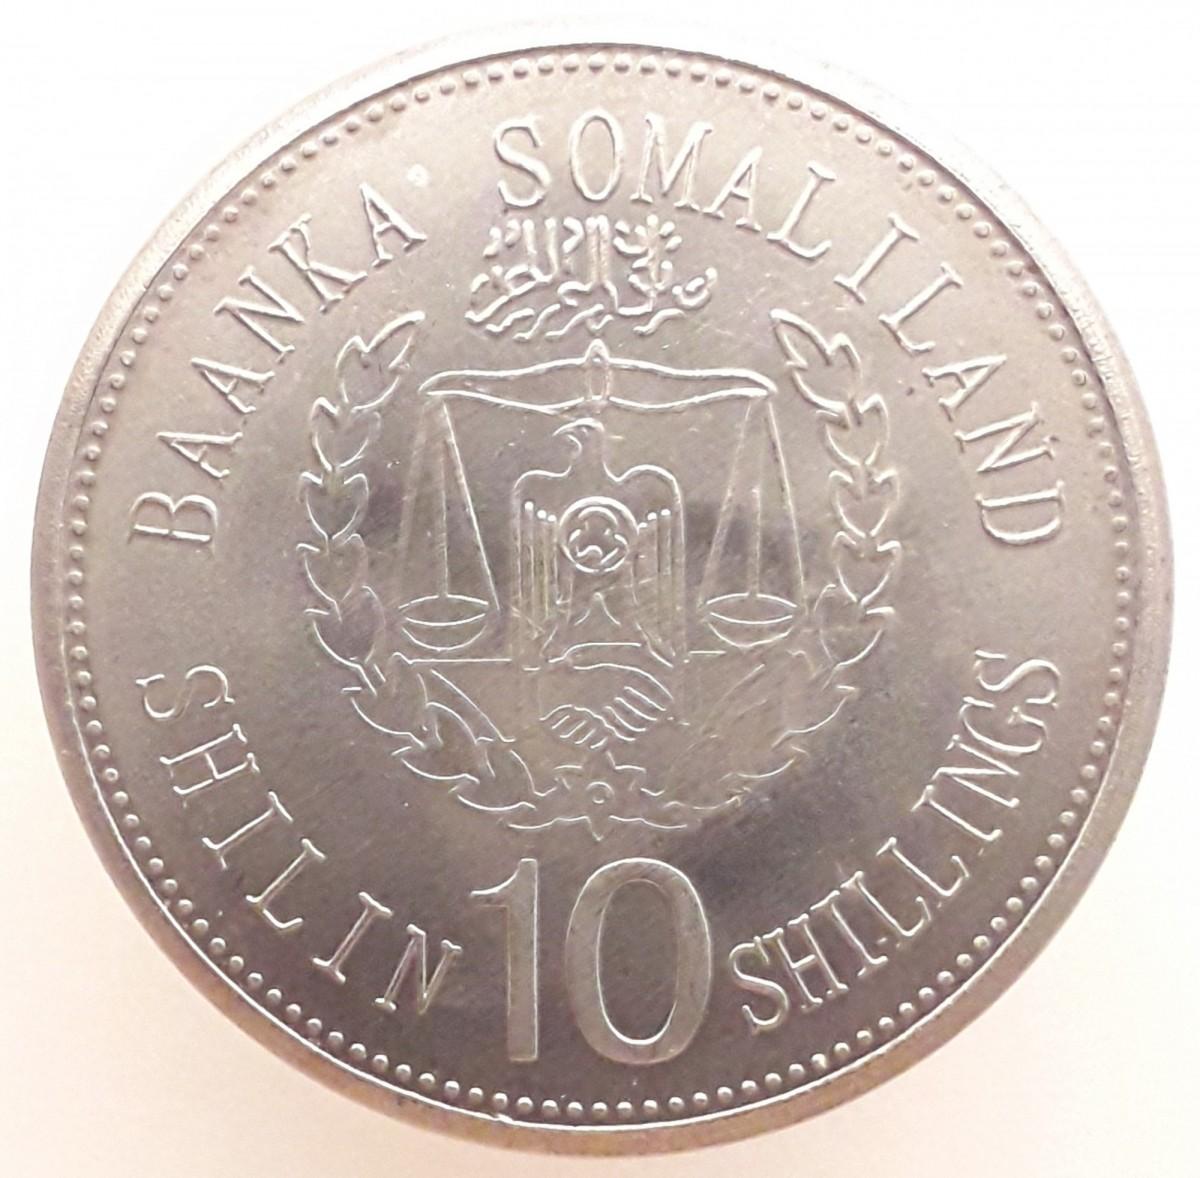 Сомалиленд 10 шиллингов 2012 года - Кролик код 22640